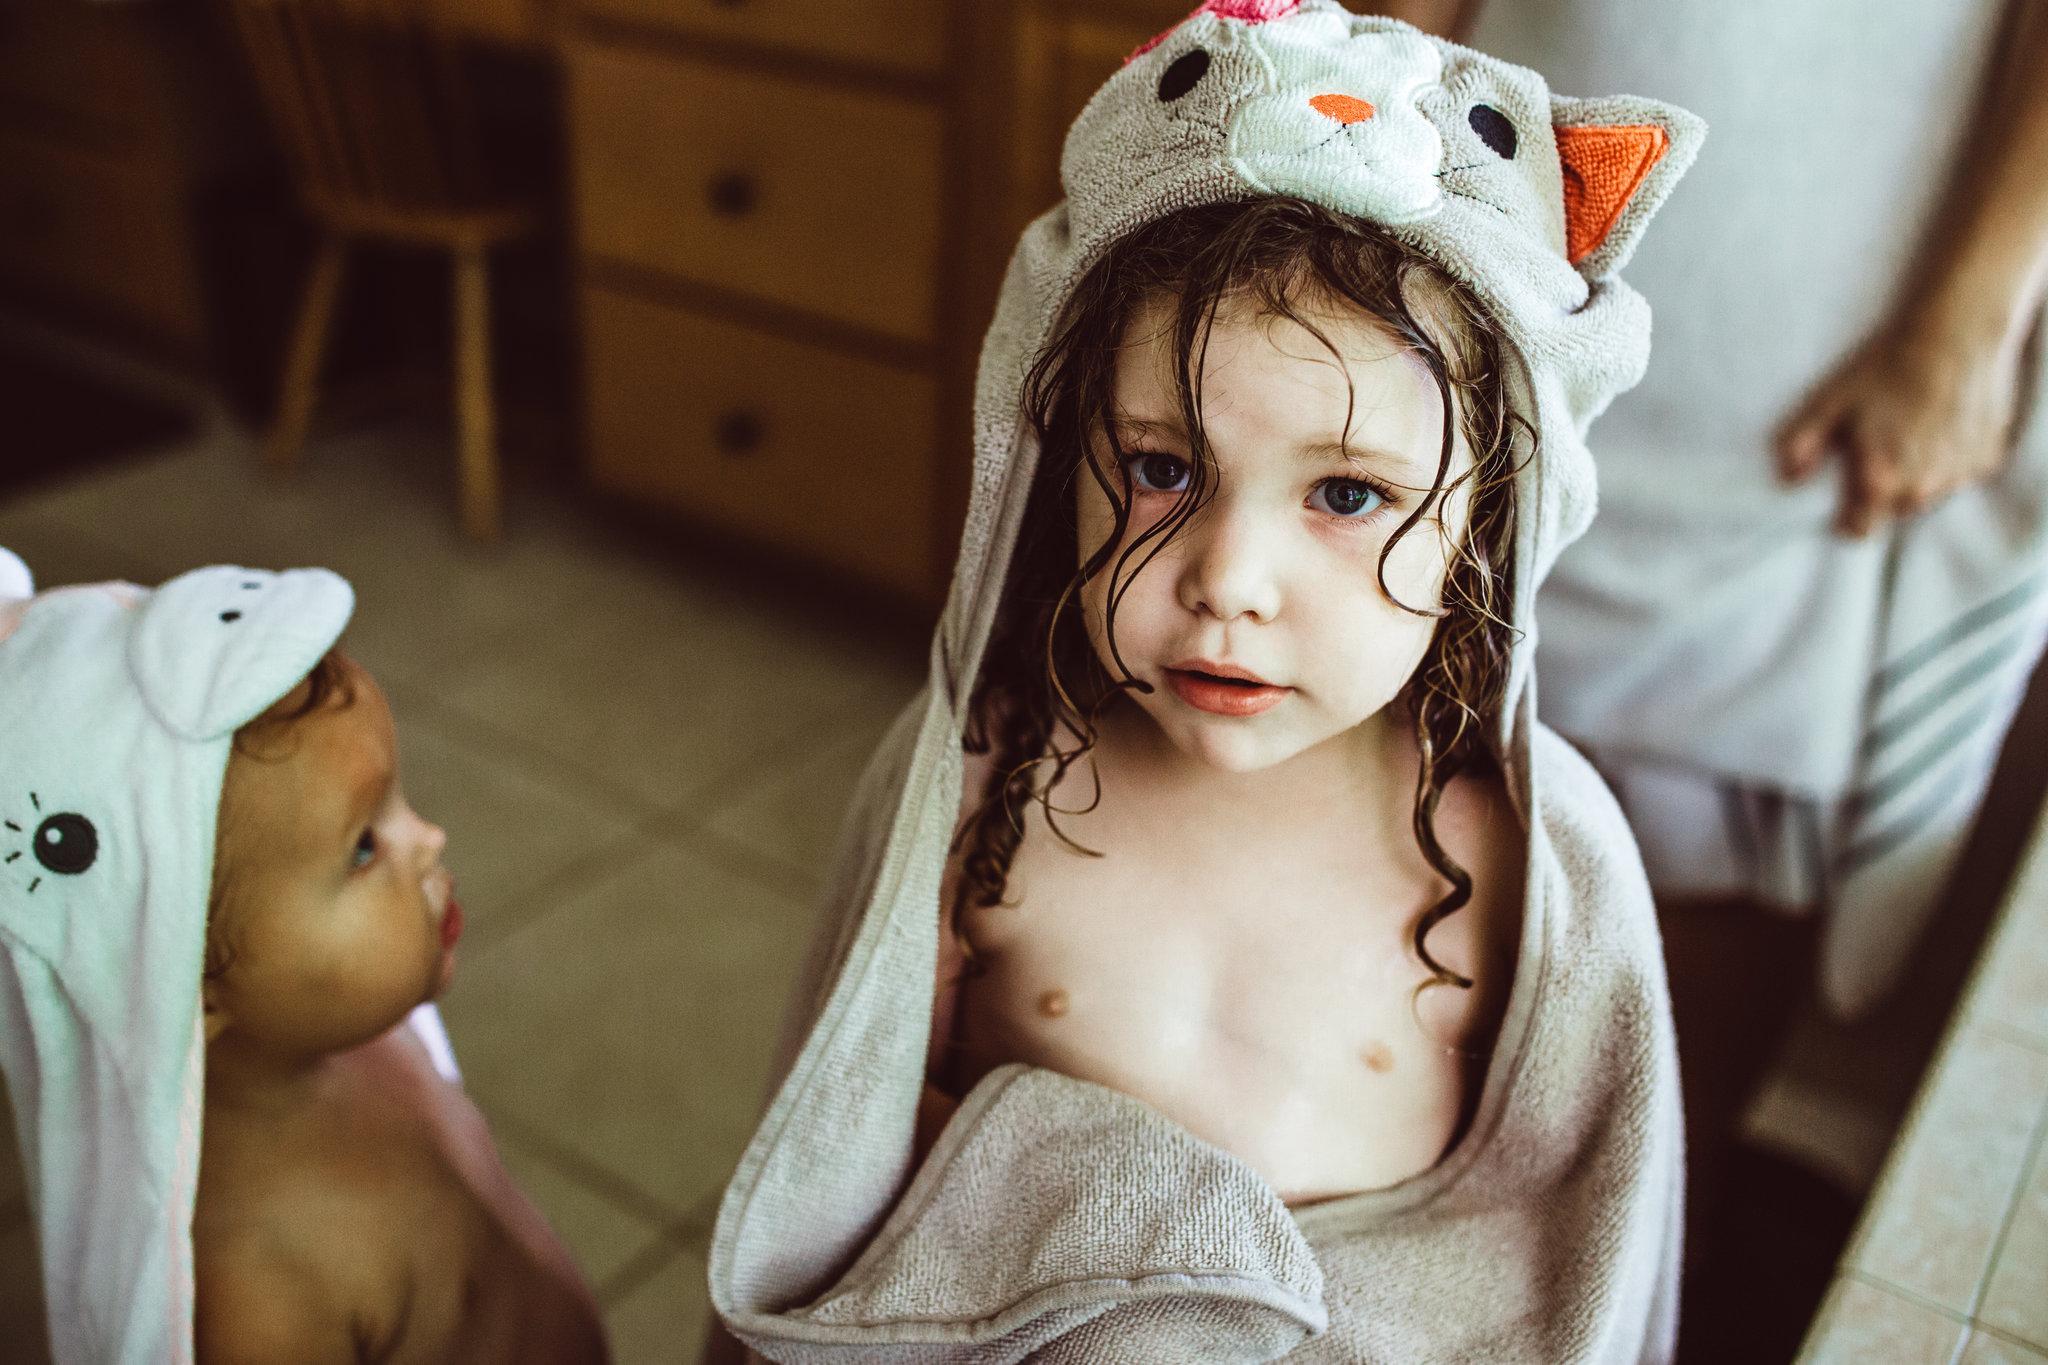 Little girls wear animal bathtub hoods after bath